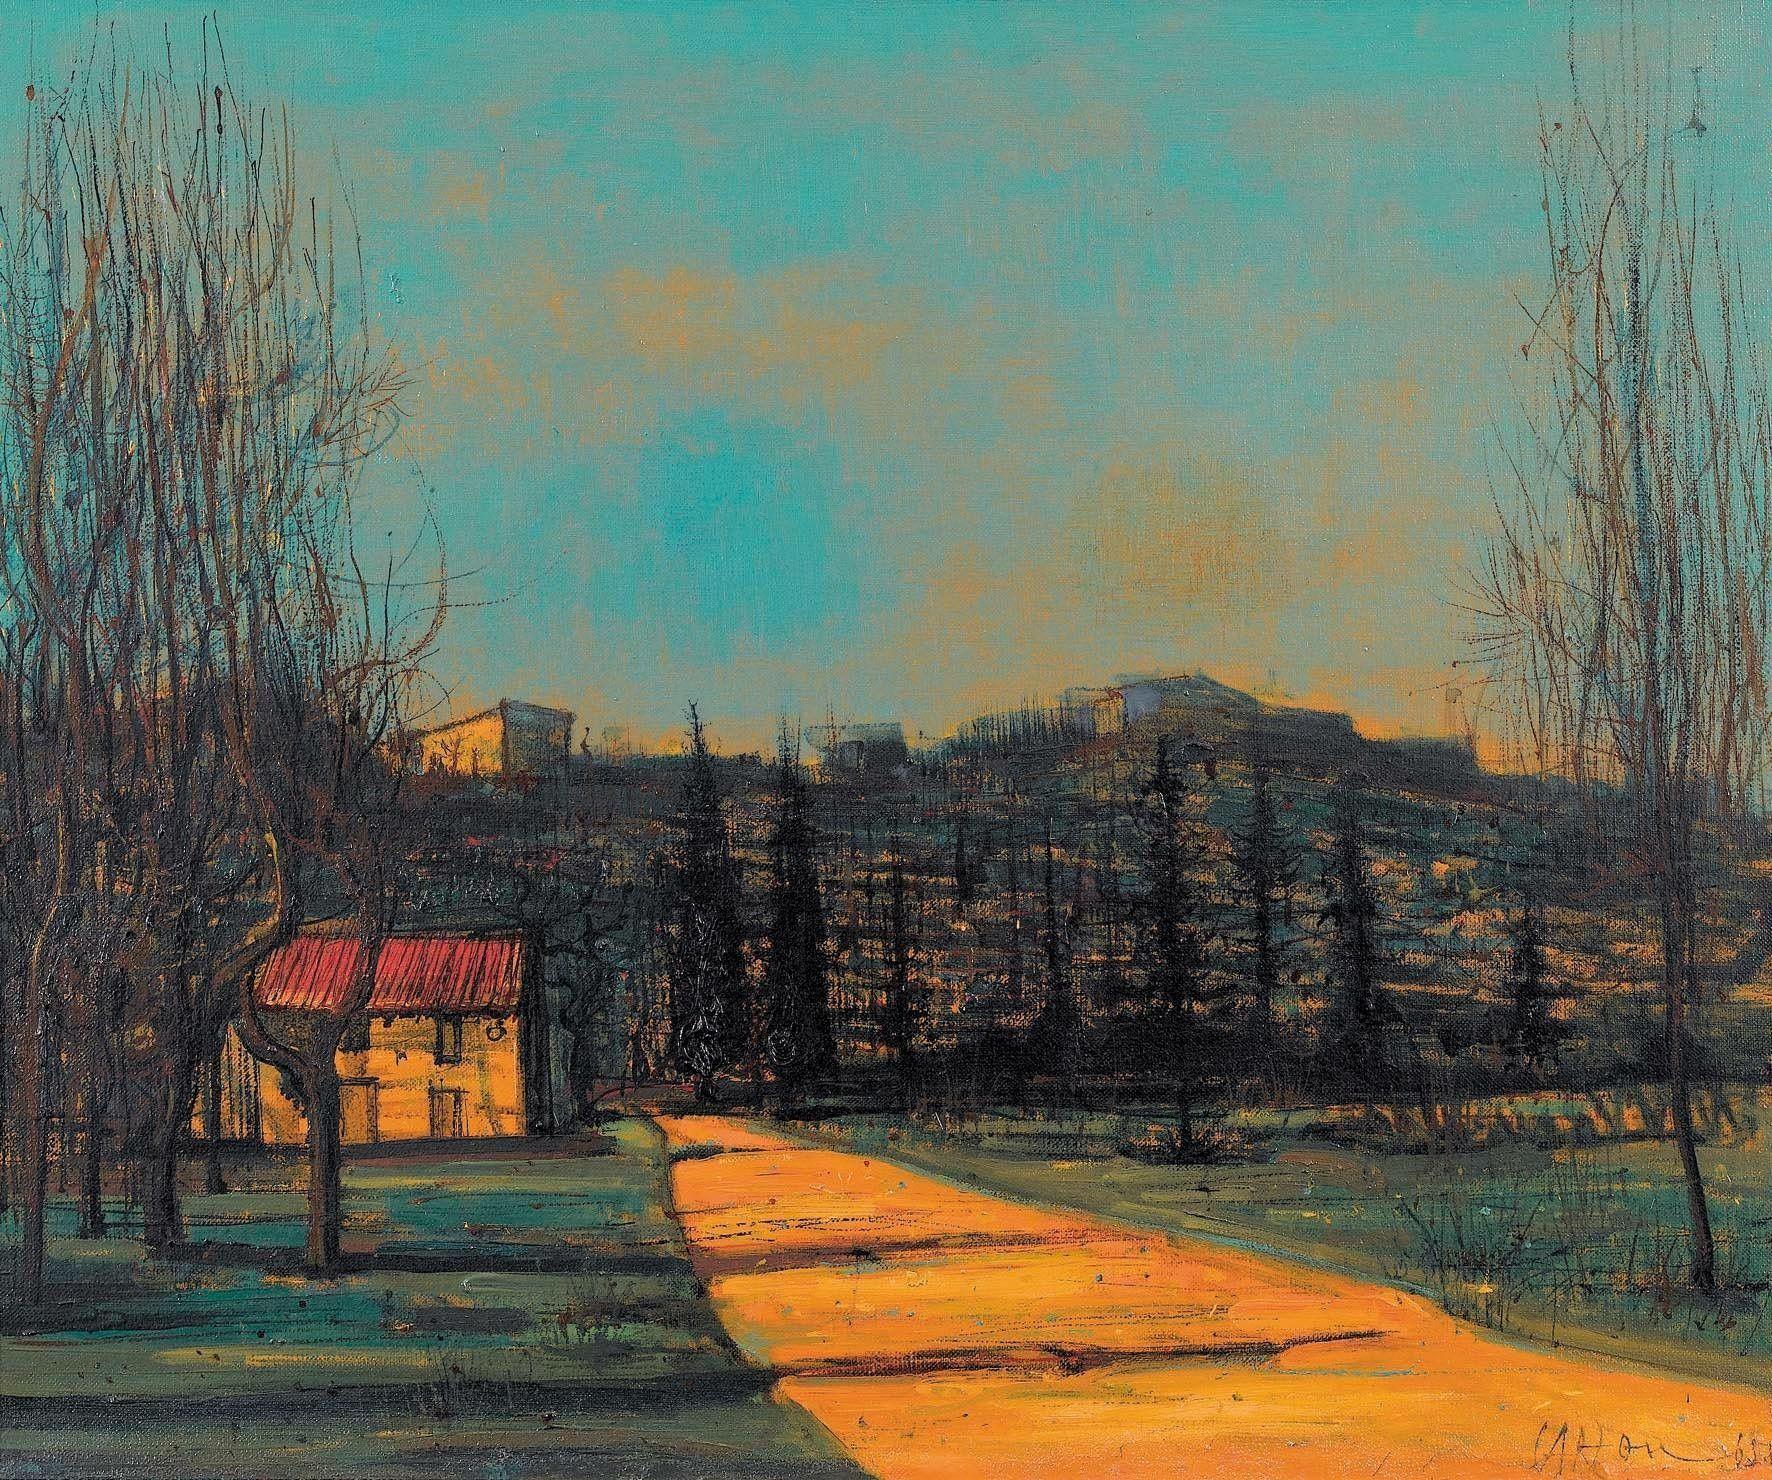 Paysage 2000 destiné jean carzou (karnik zouloumian, 1907 -2000) paysage meridional, 1965